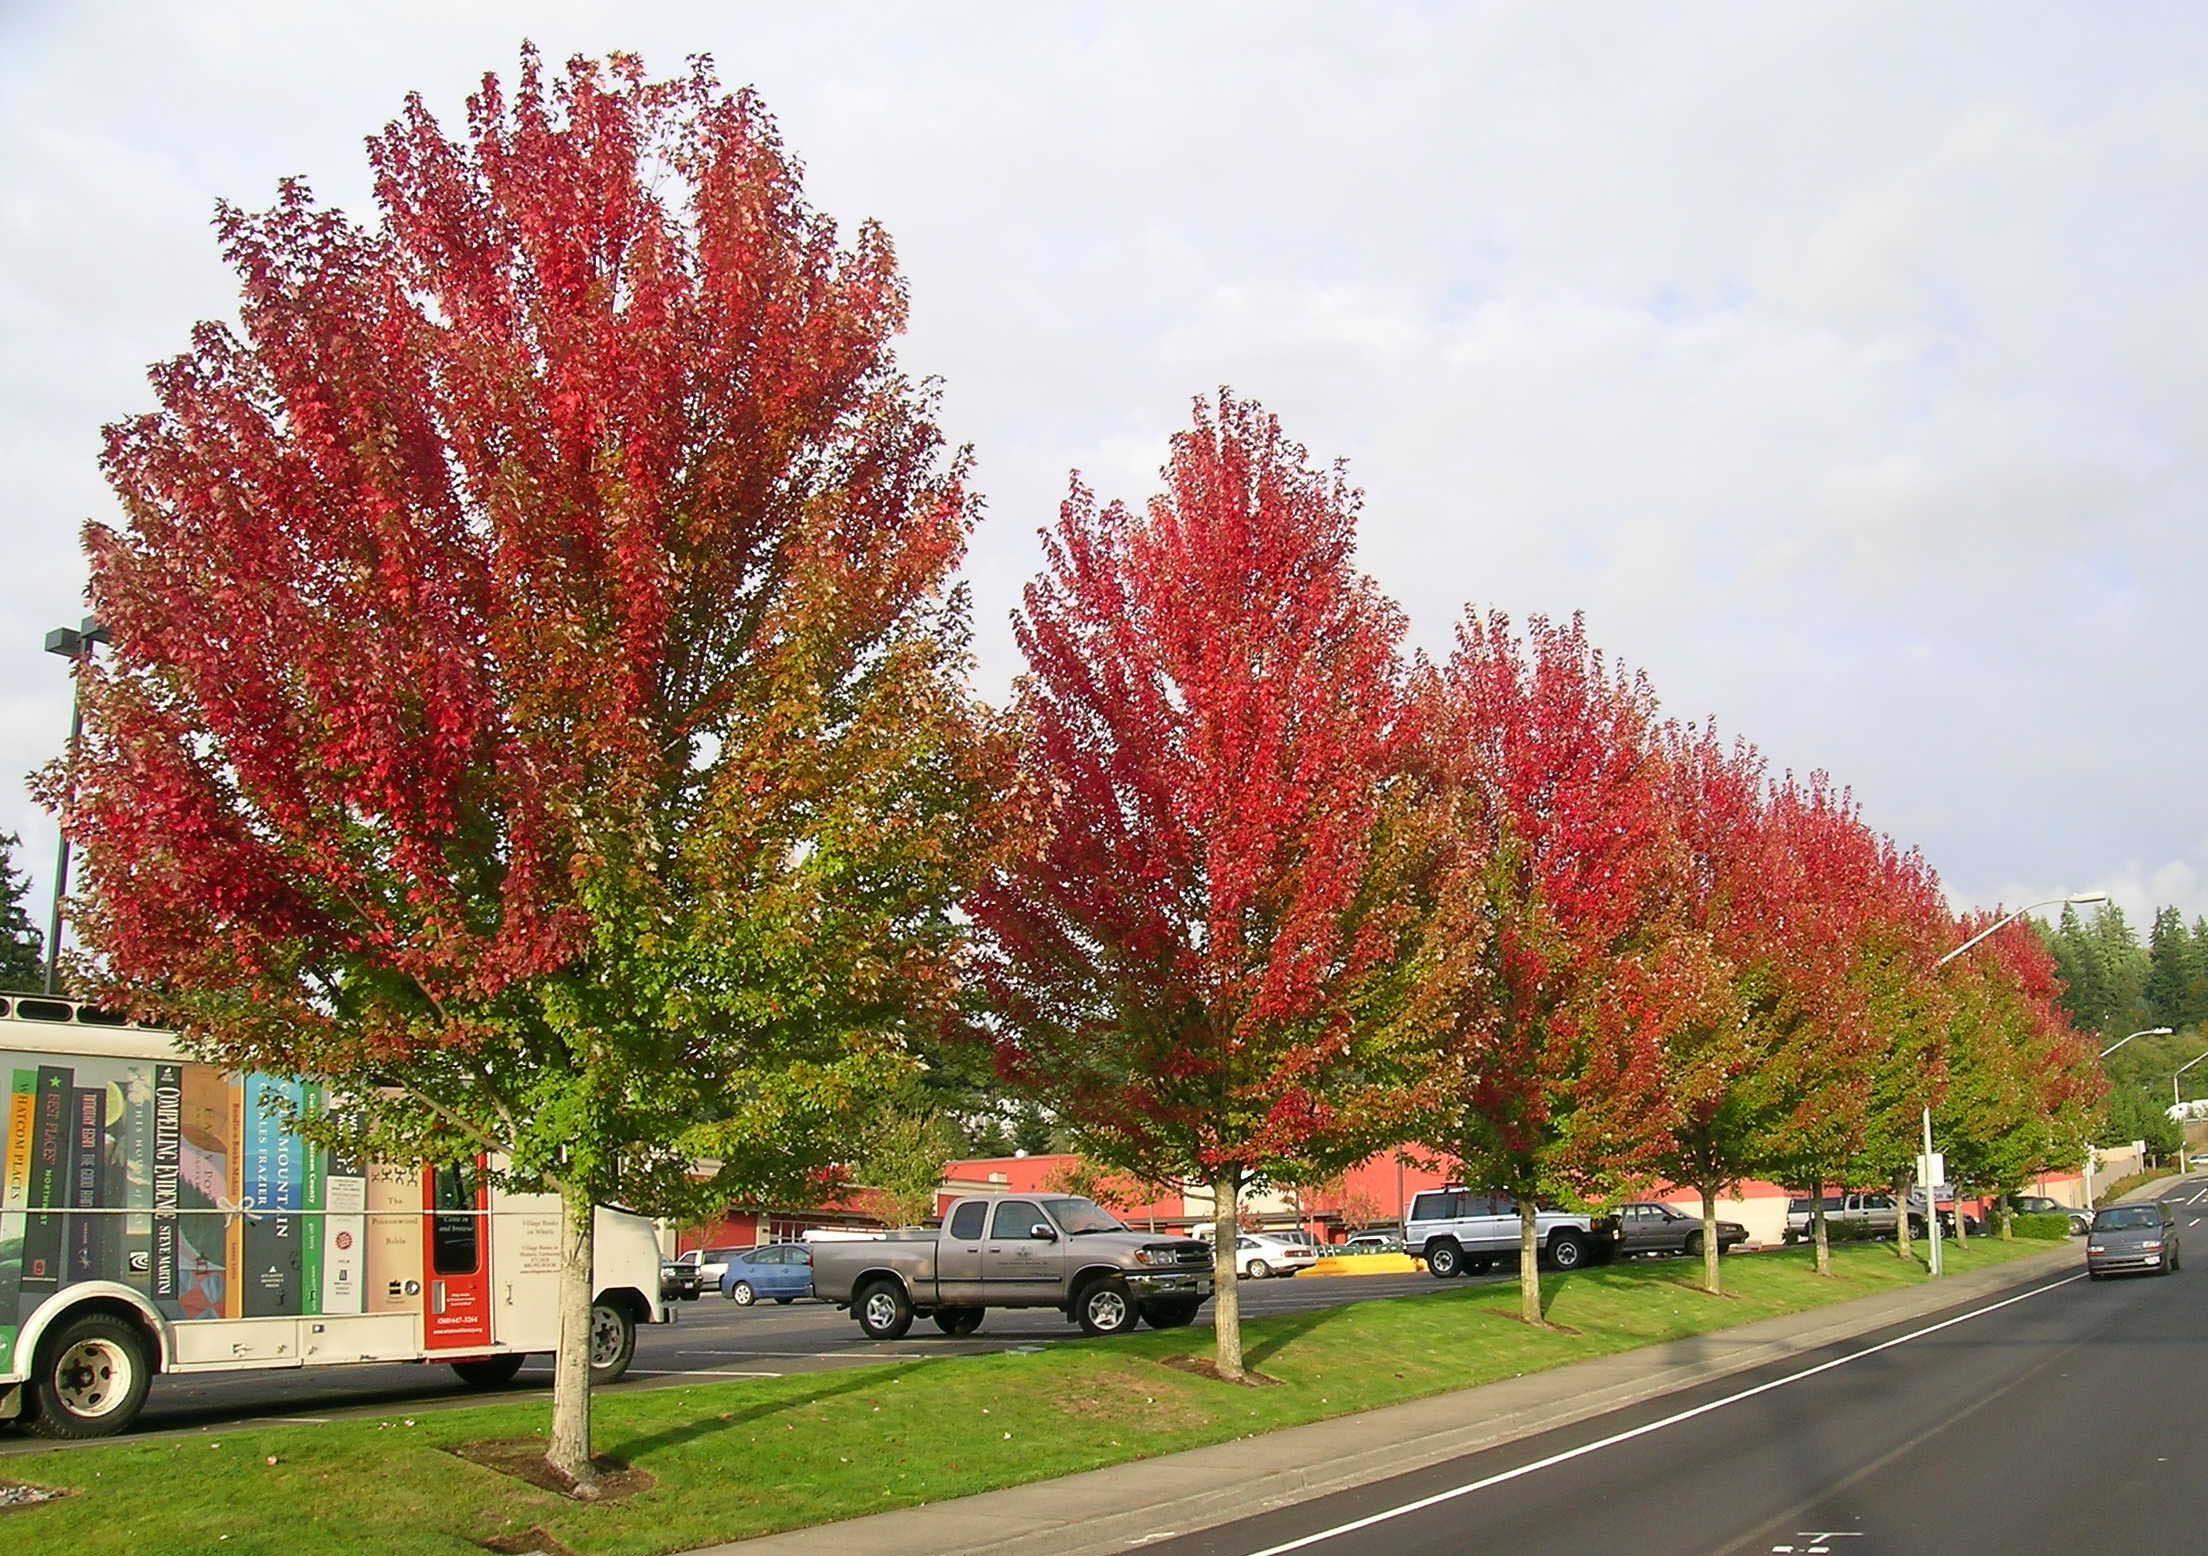 Autumn Blaze Maple Trees And Focal Points Autumn Blaze Maple